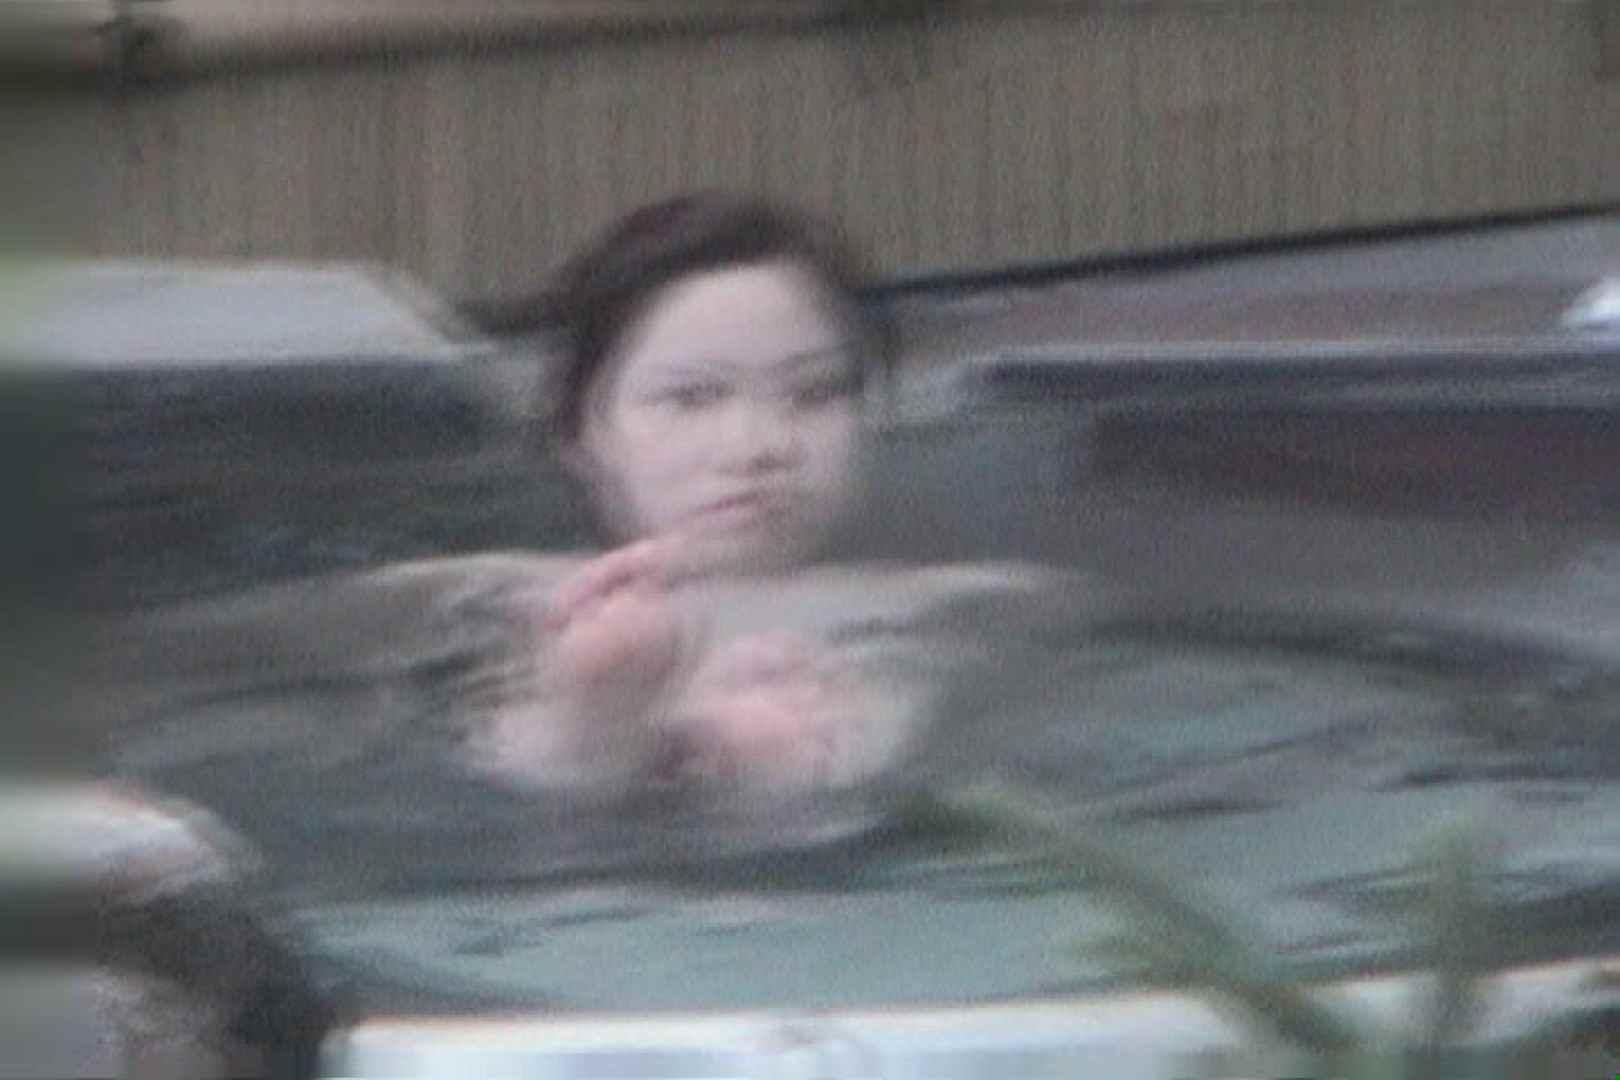 Aquaな露天風呂Vol.602 露天風呂突入 性交動画流出 98pic 53